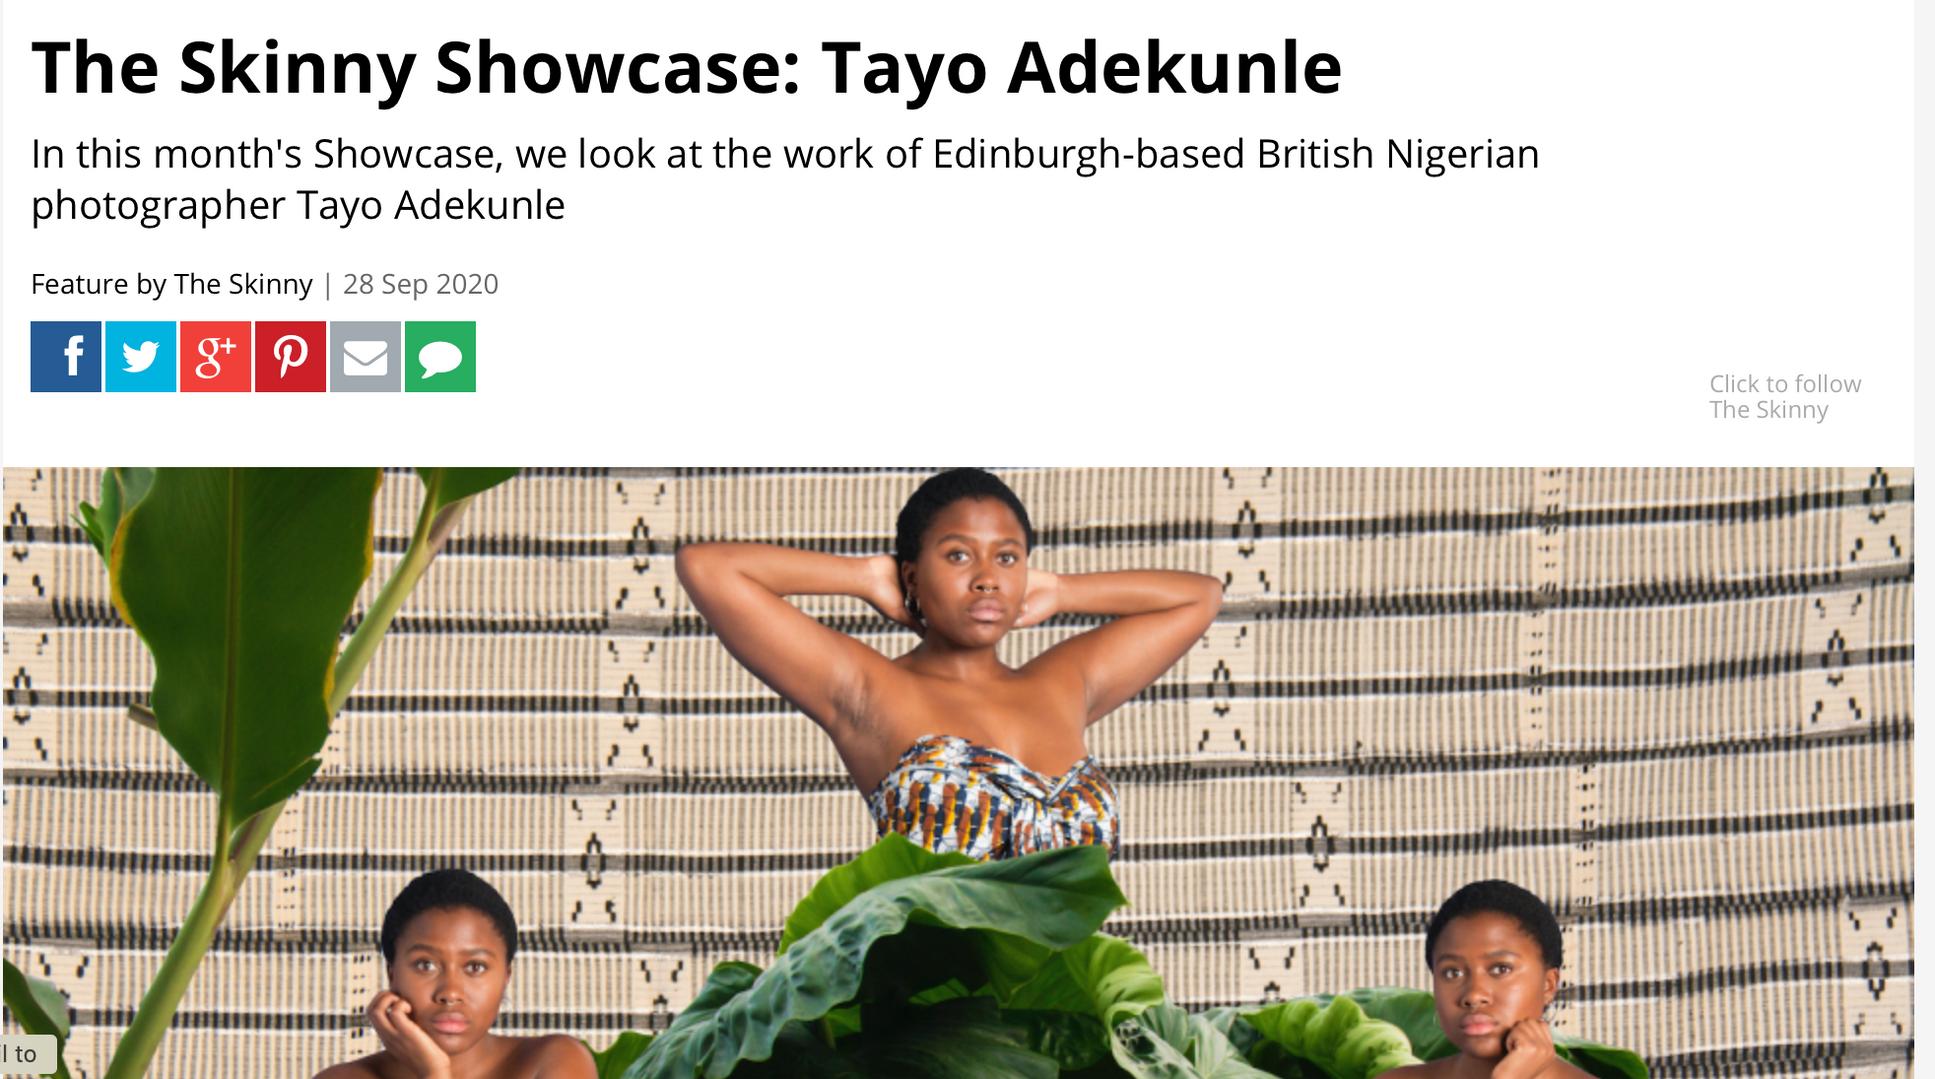 The Skinny Showcase: Tayo Adekunle